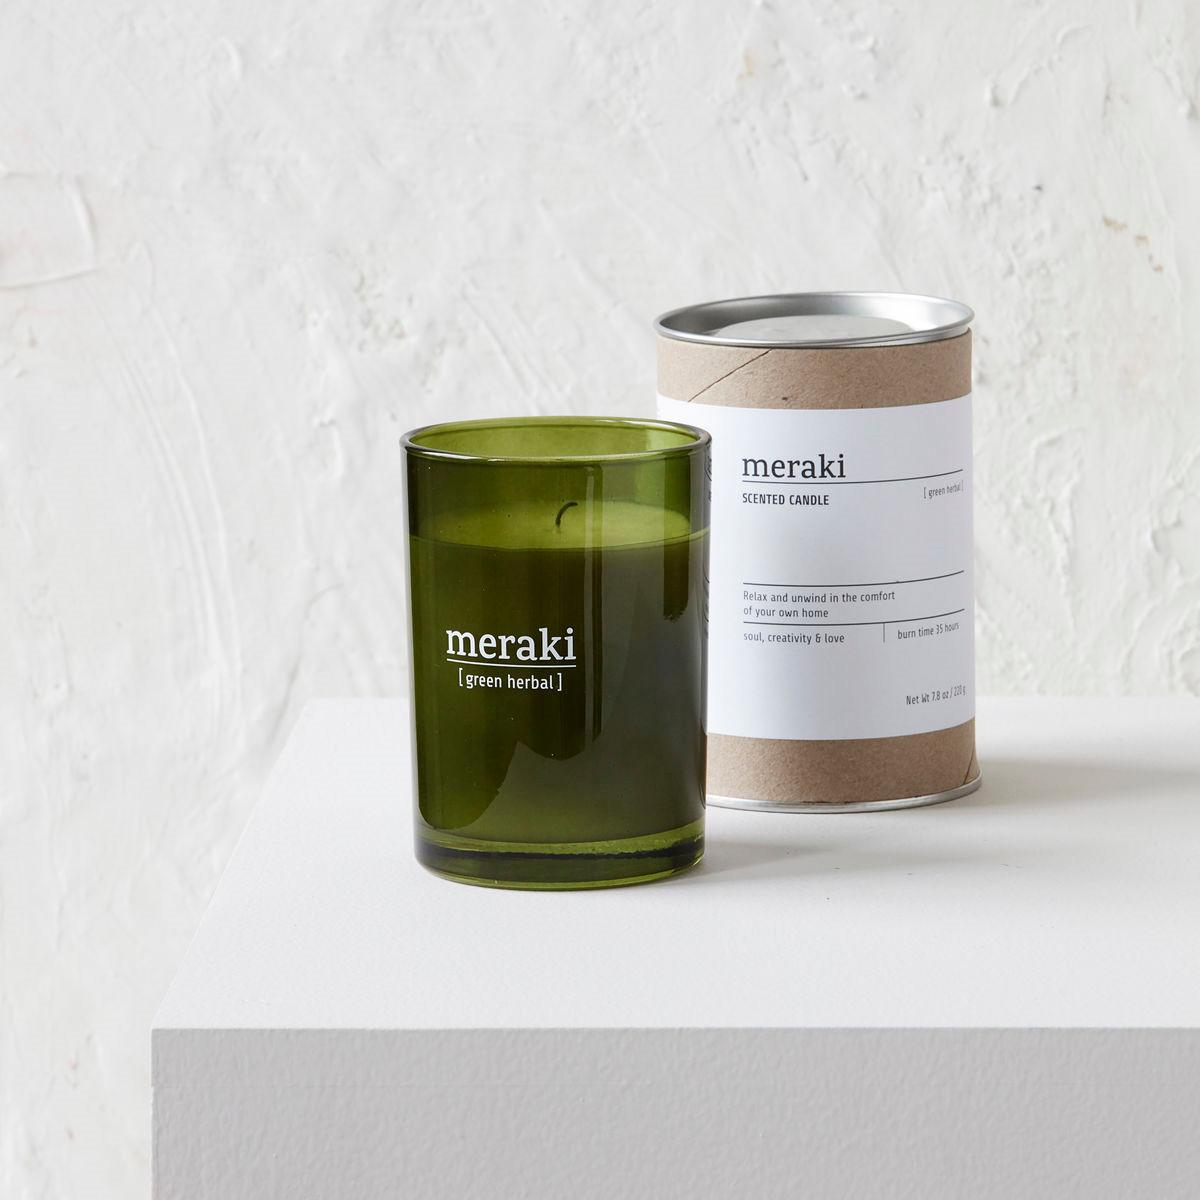 Meraki Scented Candle Green Herbal